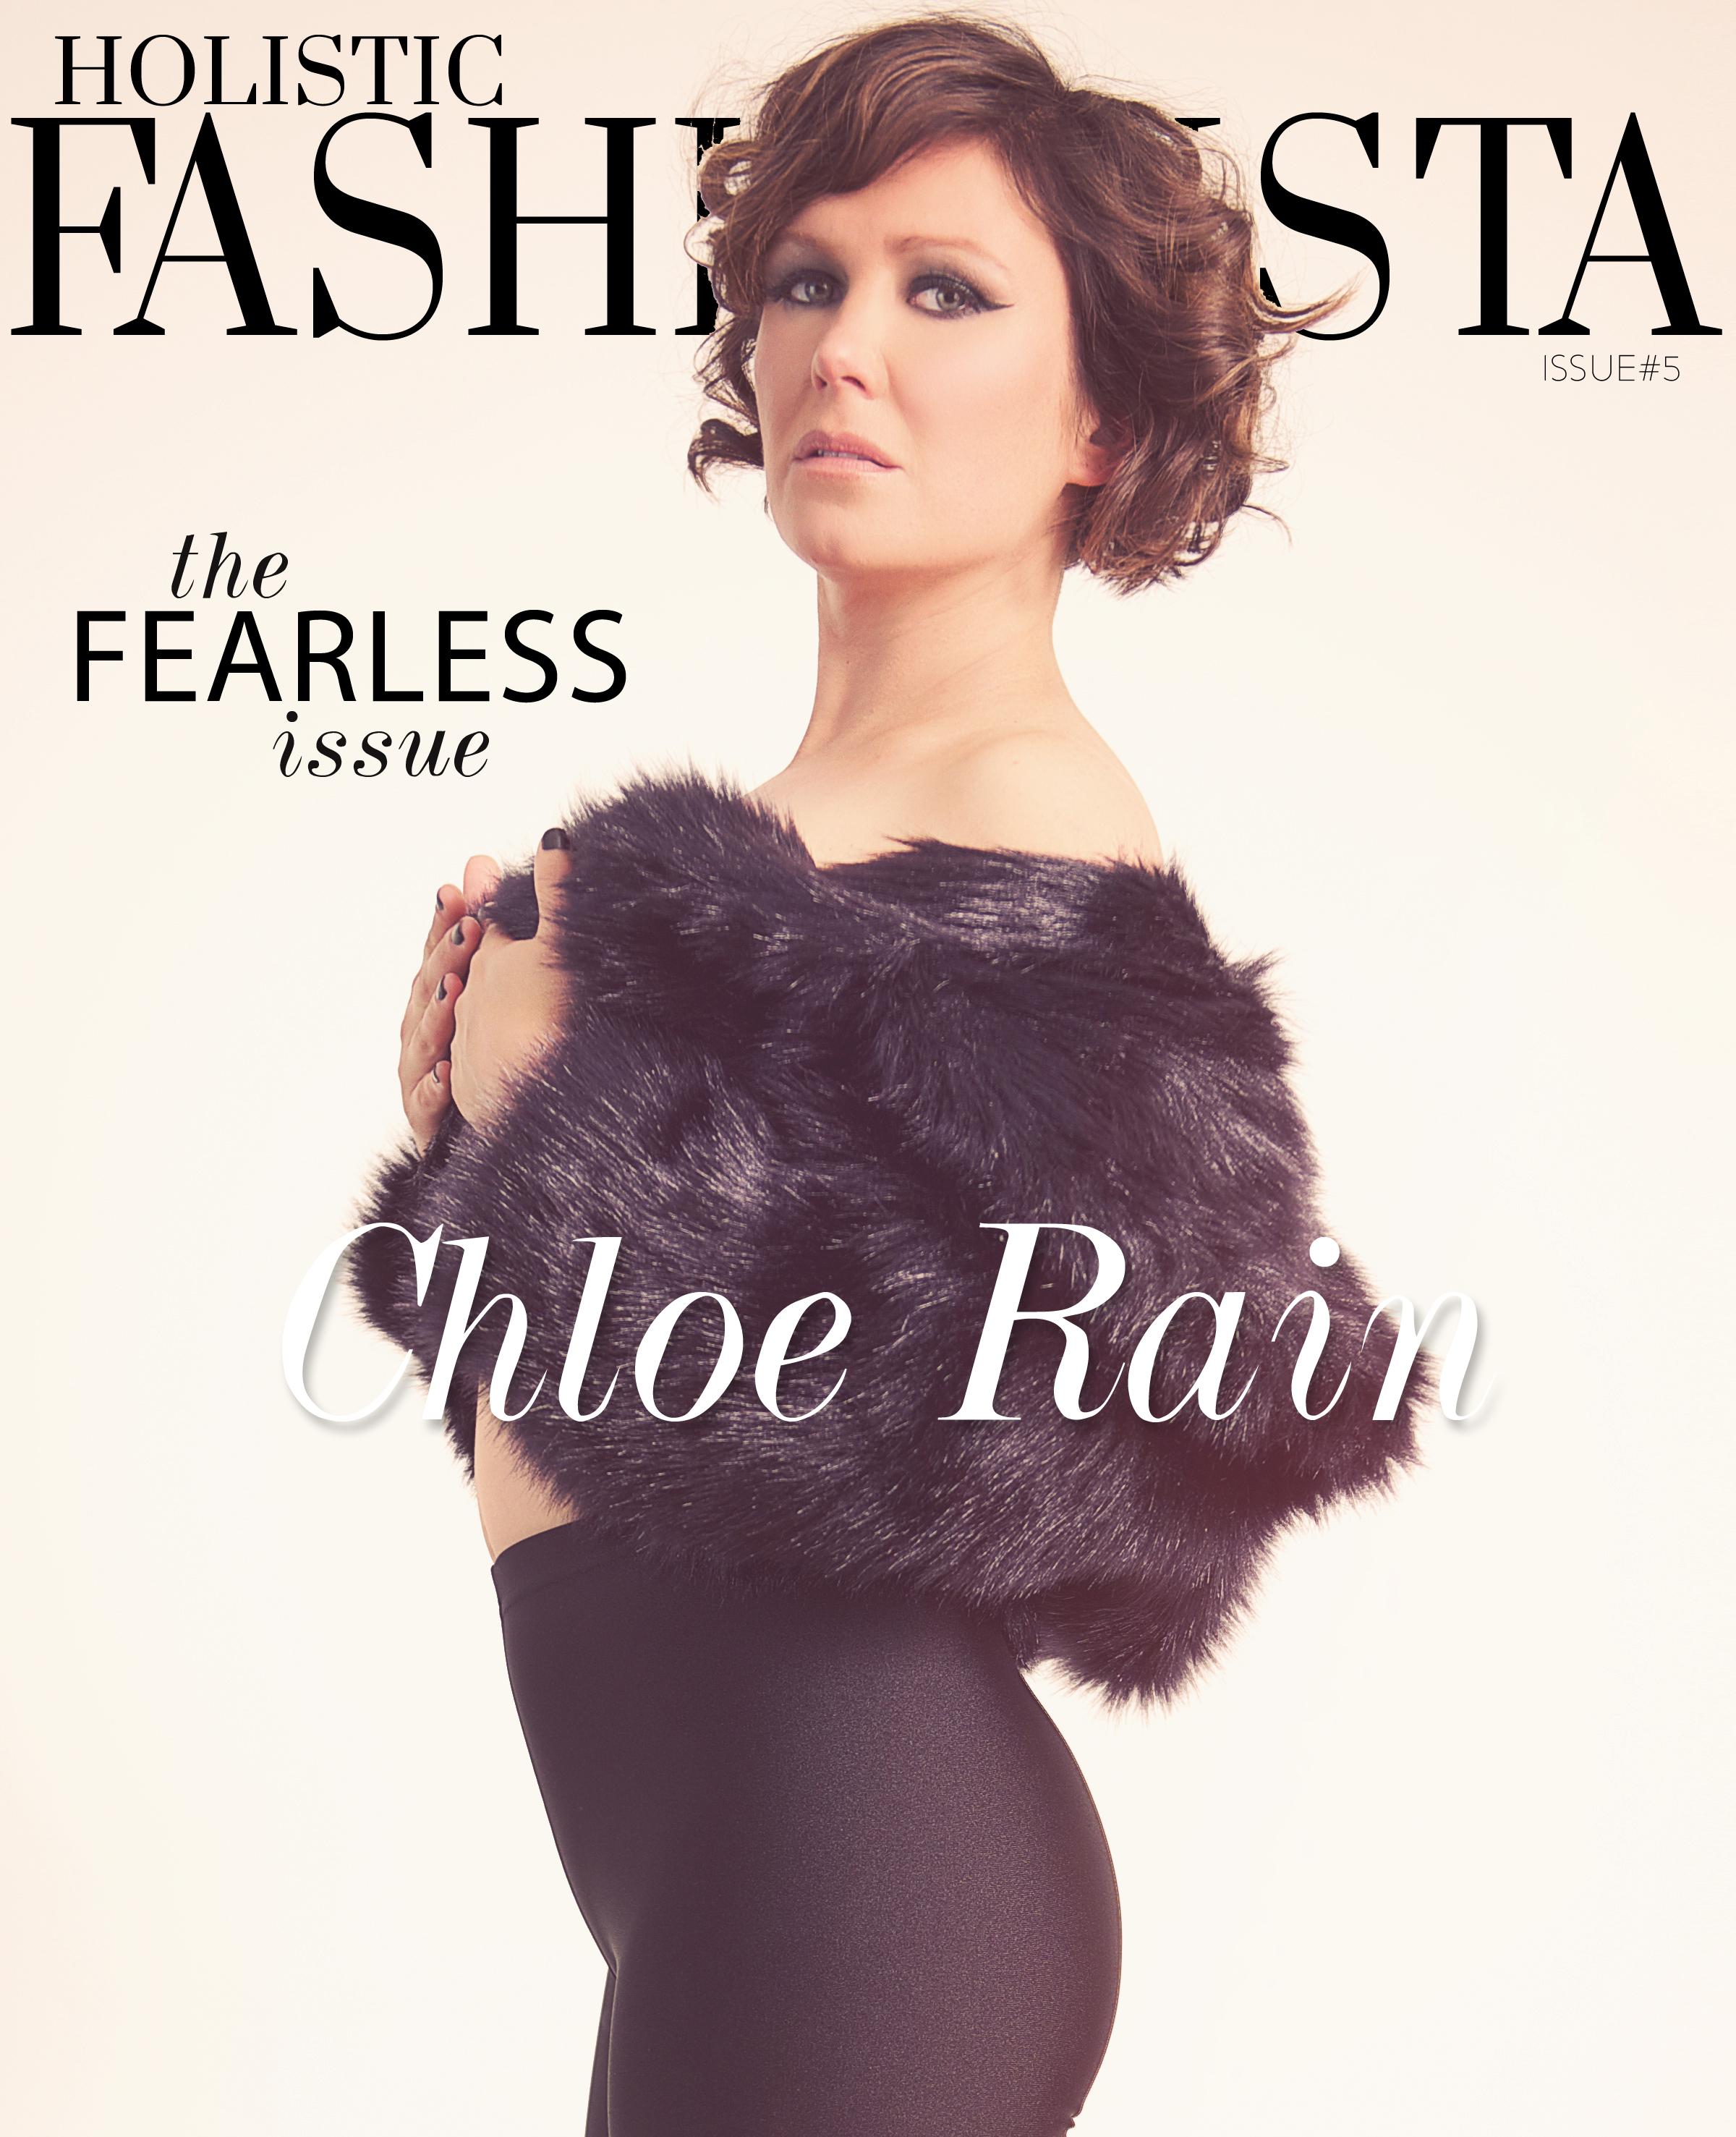 Holistic Fashionista Magazine Issue#5